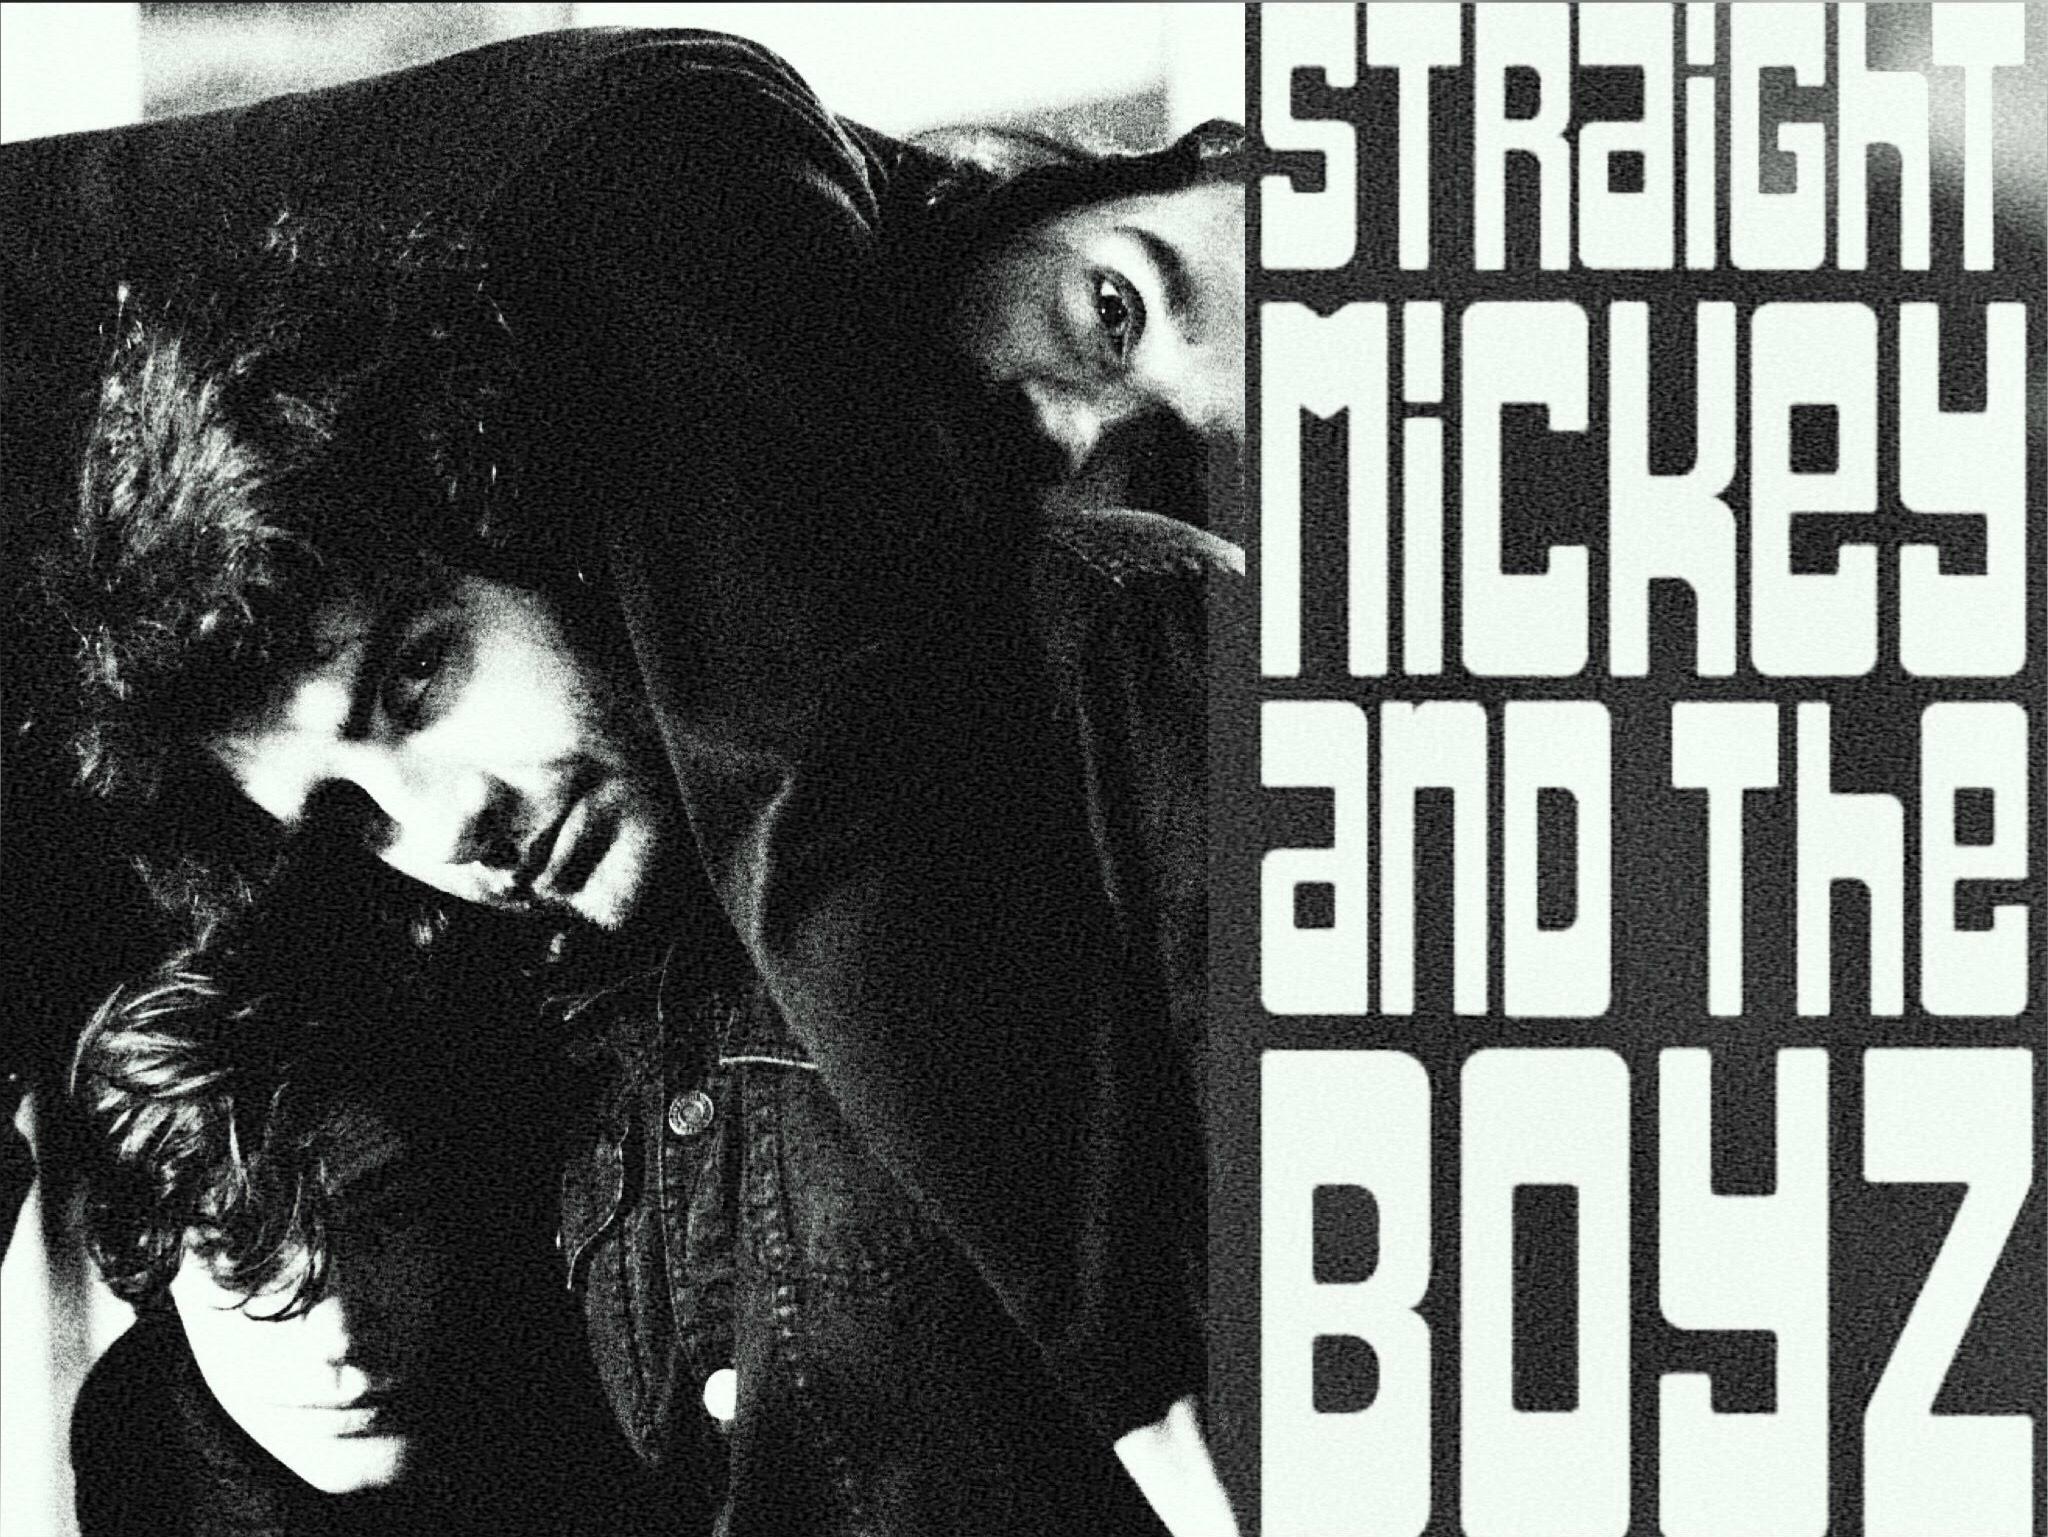 Straight Mickey and The Boyz